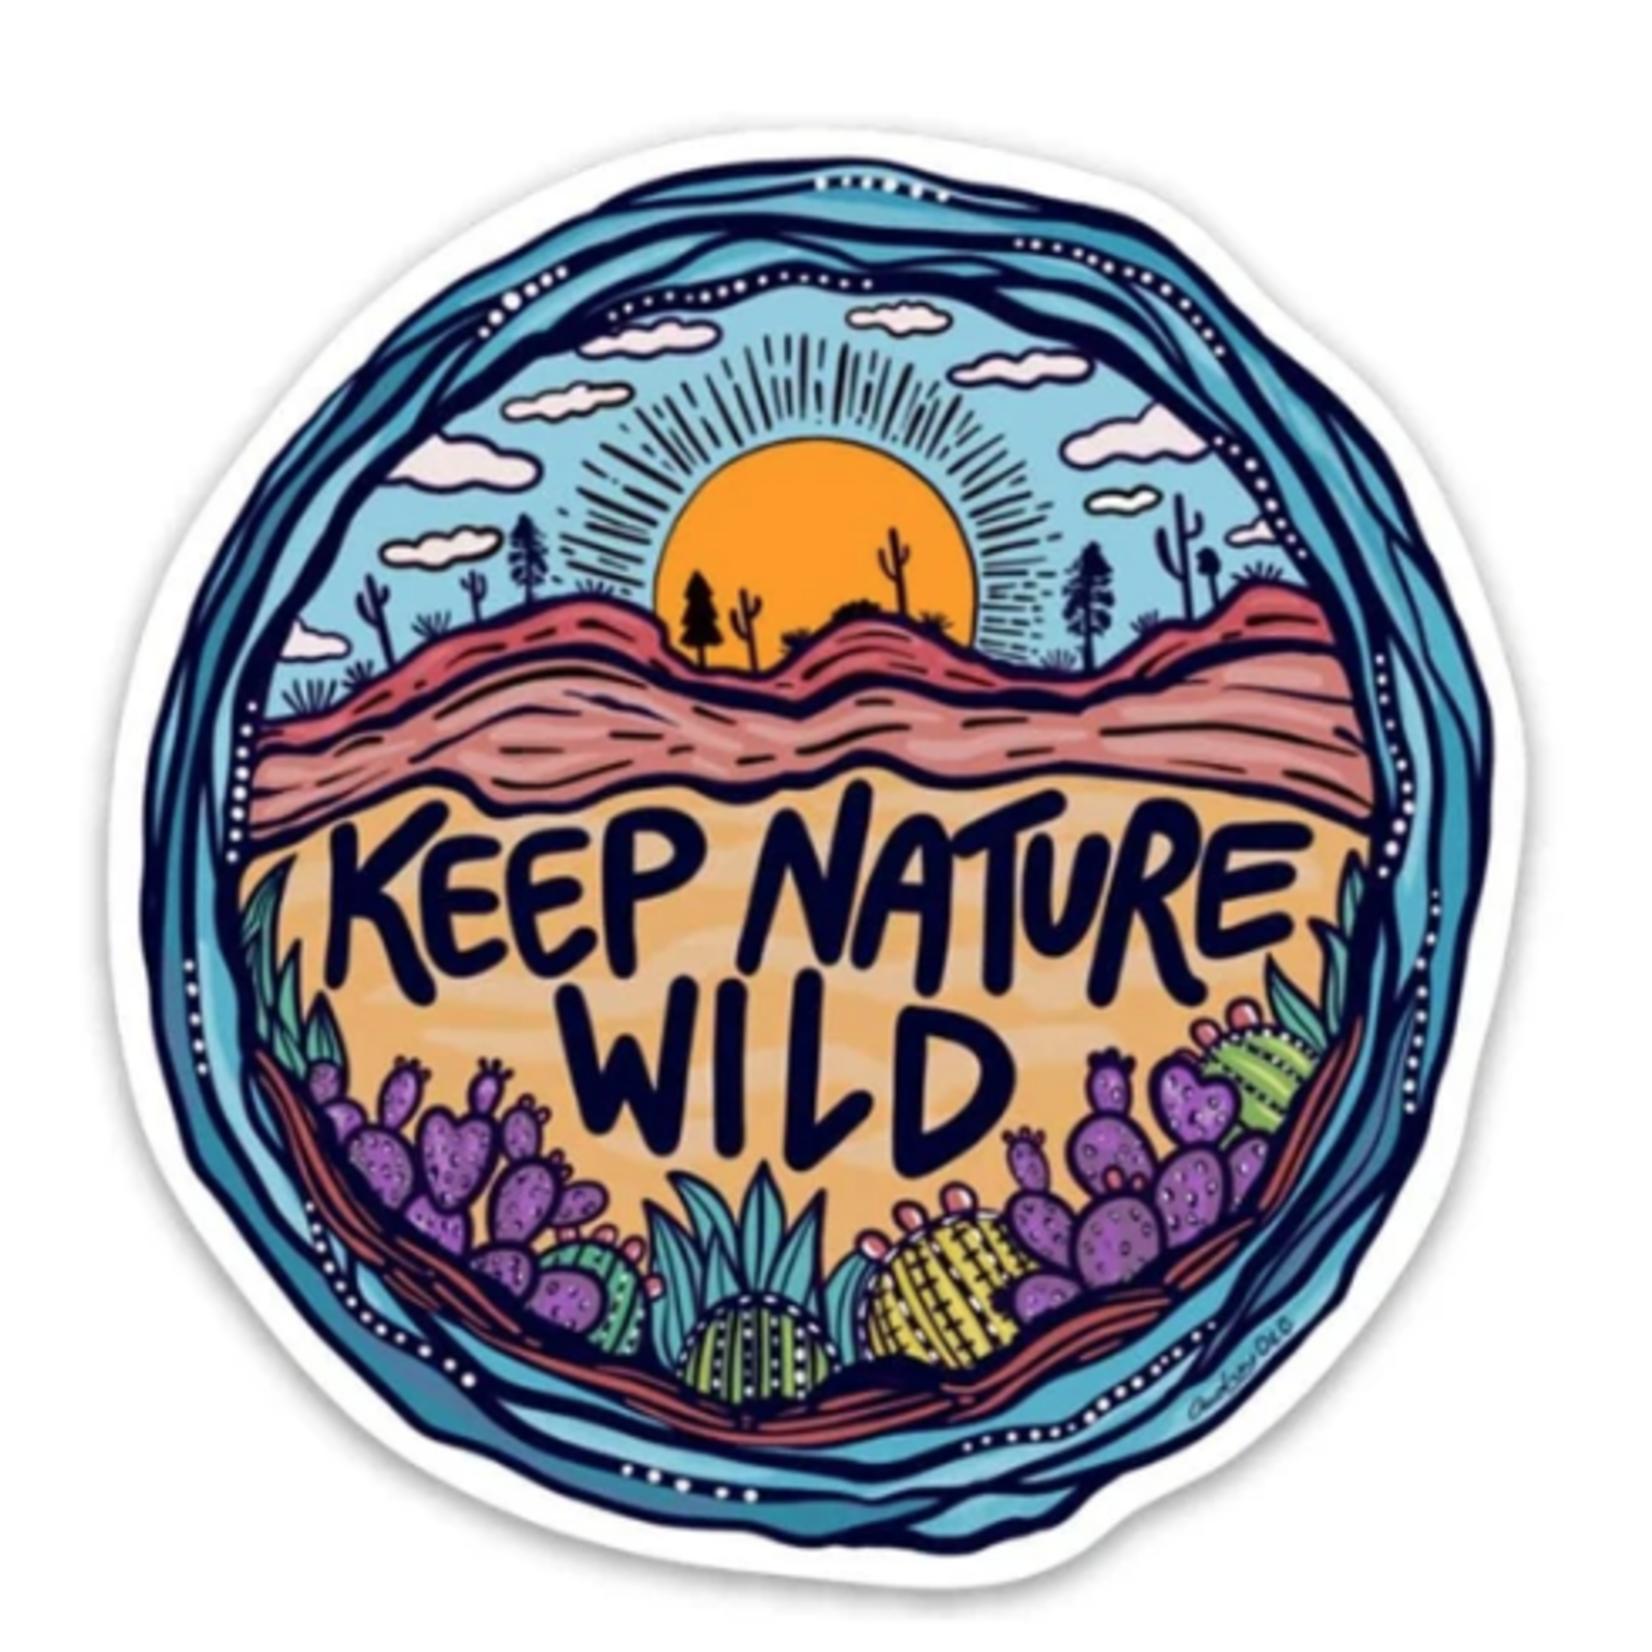 Keep Nature Wild Wild Earth Day 2019 Sticker